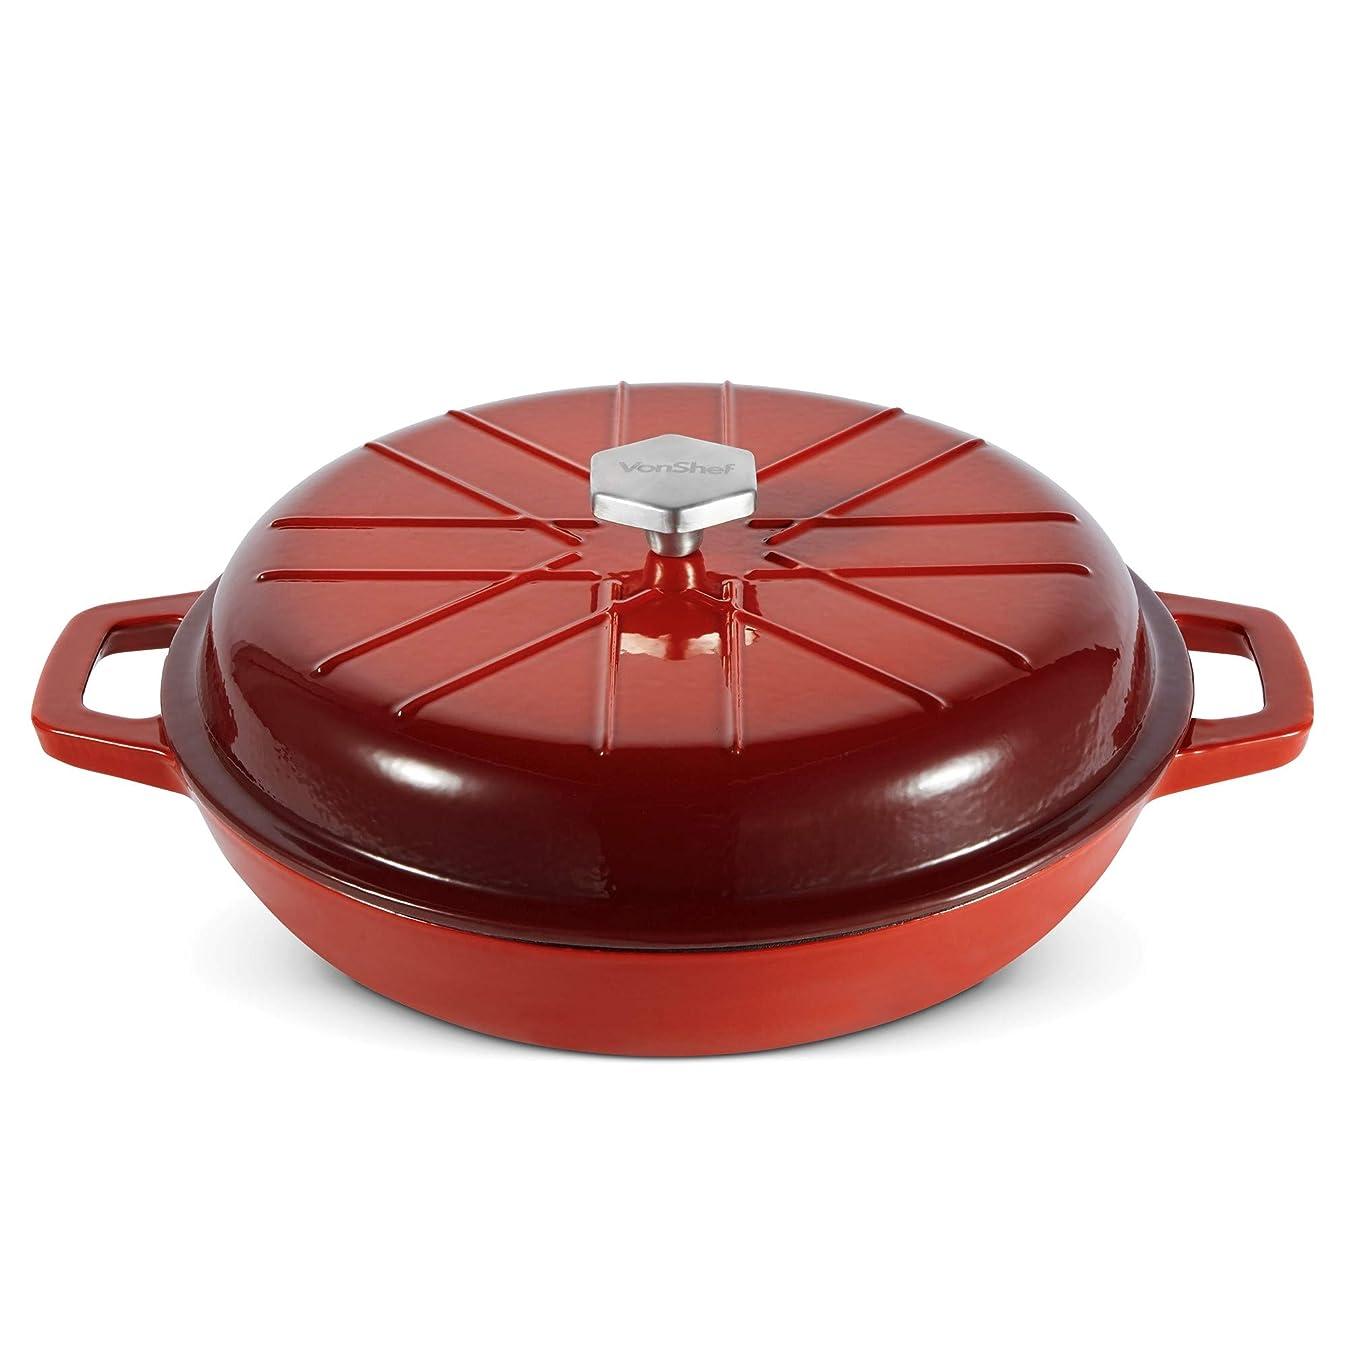 VonShef Cast Iron Shallow Dutch Oven Casserole Dish Braiser Pan With Non-Stick Enamel Coating, Signature VonShef Style Stew Pot, Red Ombre, 3 Quarts